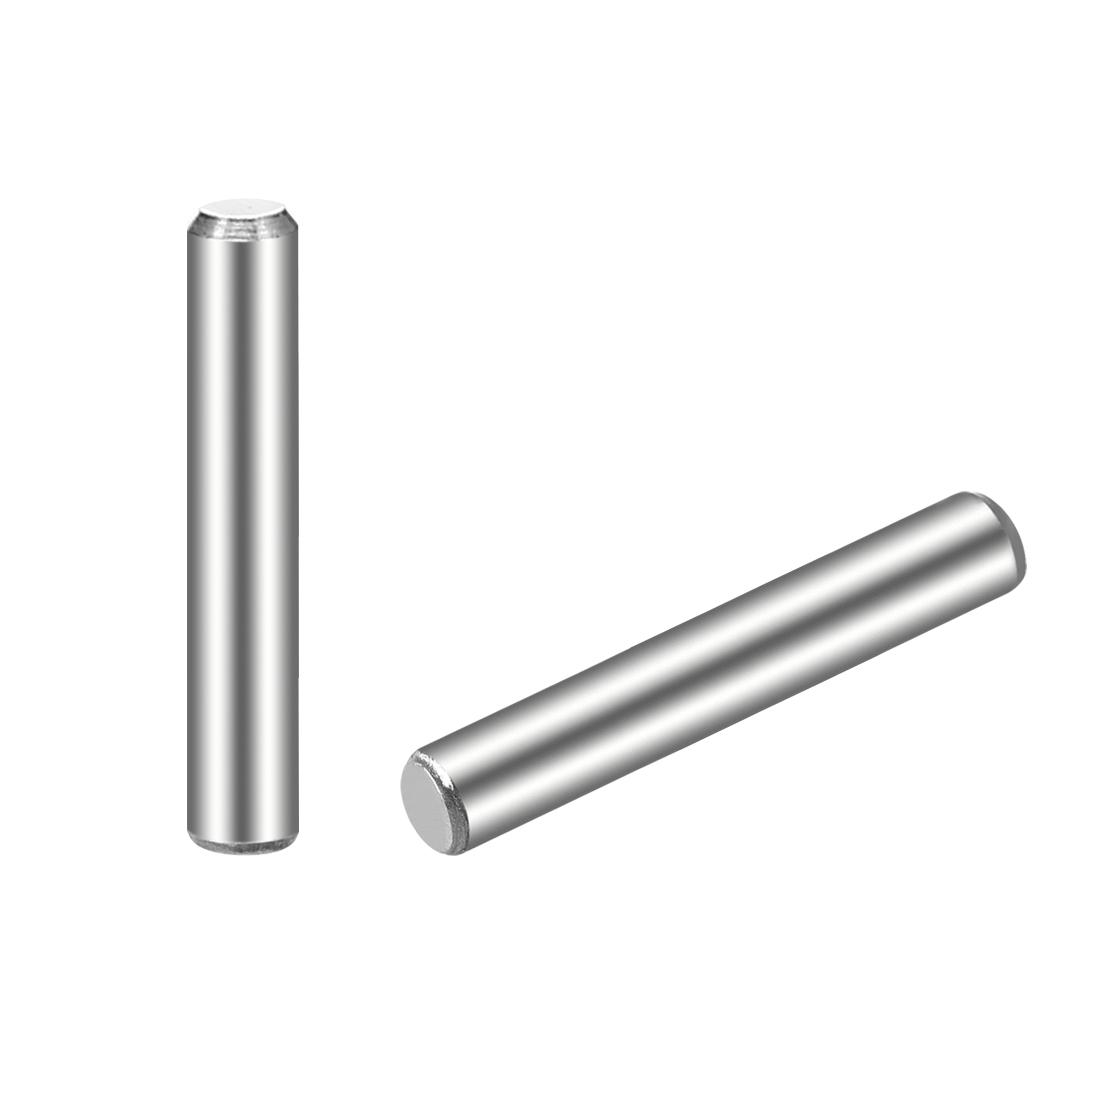 25Pcs 3mm x 18mm Dowel Pin 304 Stainless Steel Shelf Support Pin Fasten